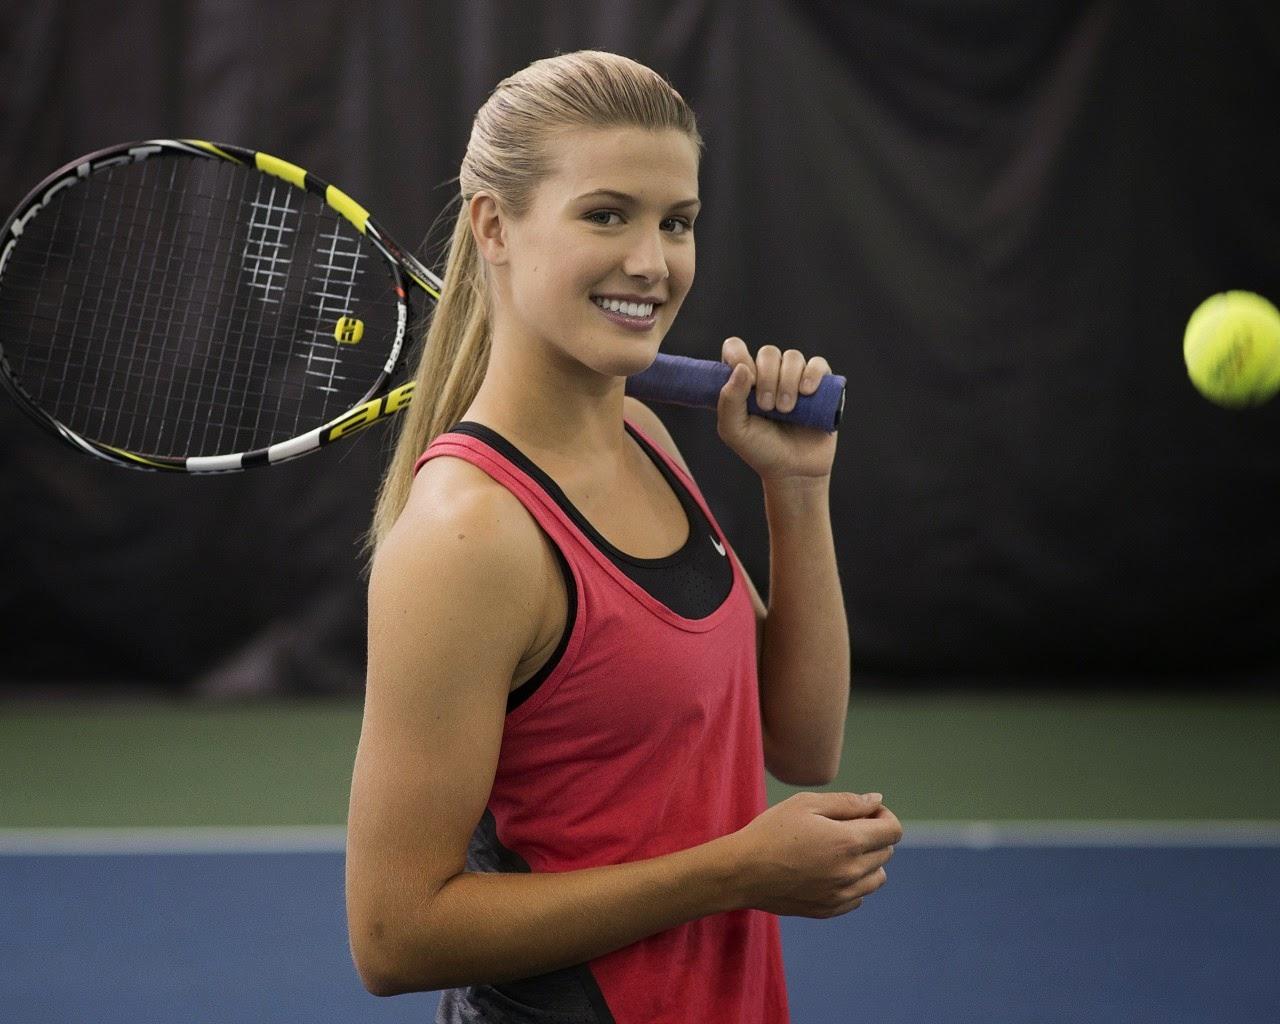 Dominika Cibulkova Latest Hd Wallpapers 2014 15 Lovely Tennis Stars